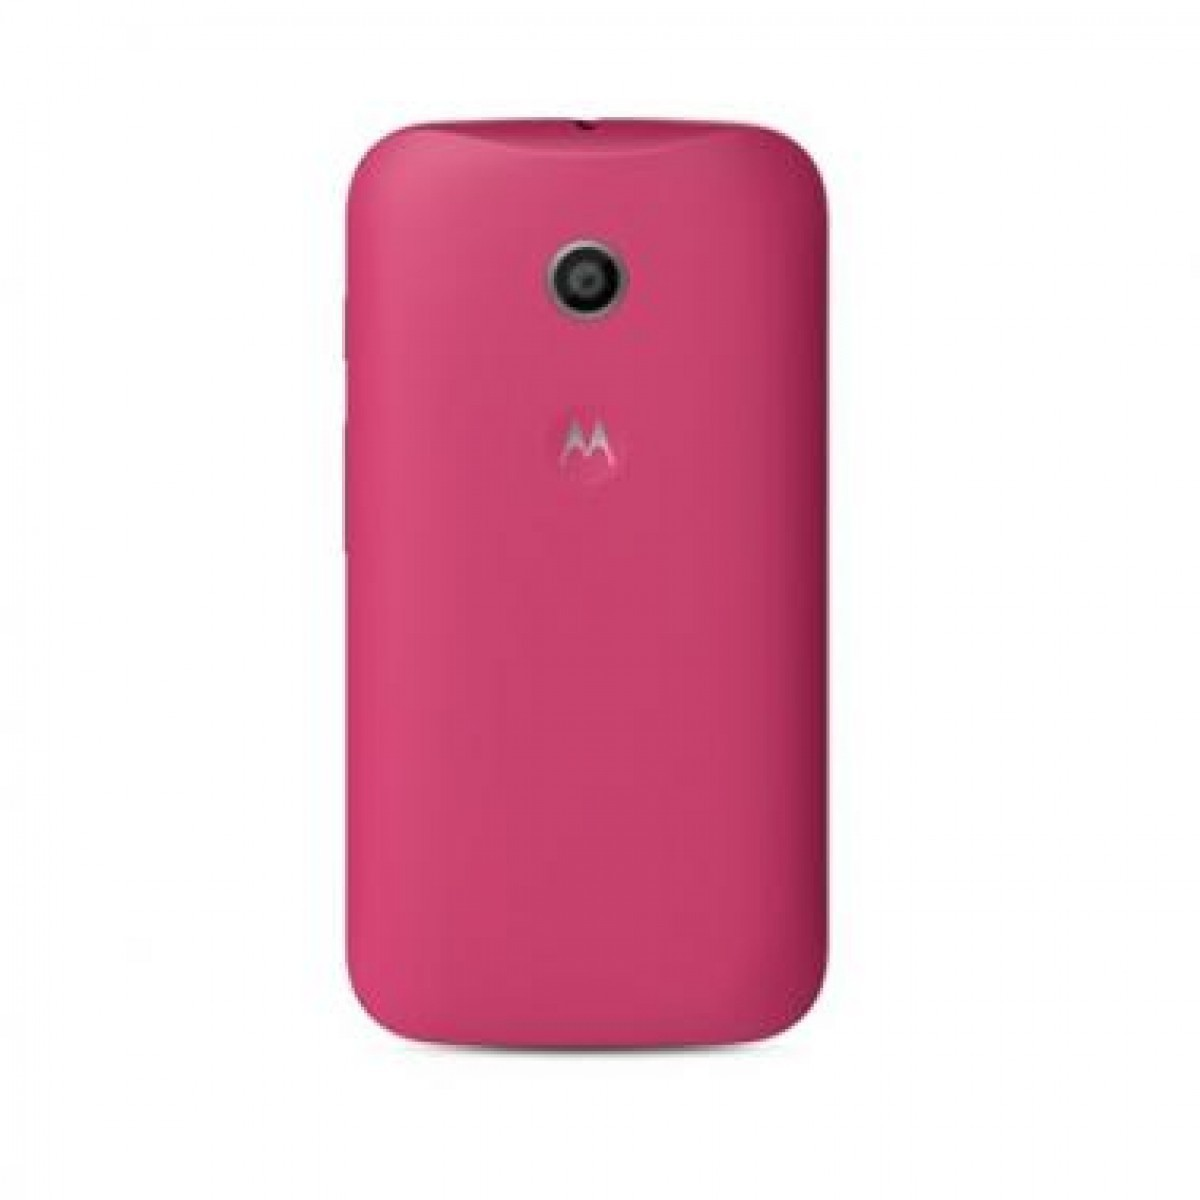 Motorola Shell für Motorola Moto E pink